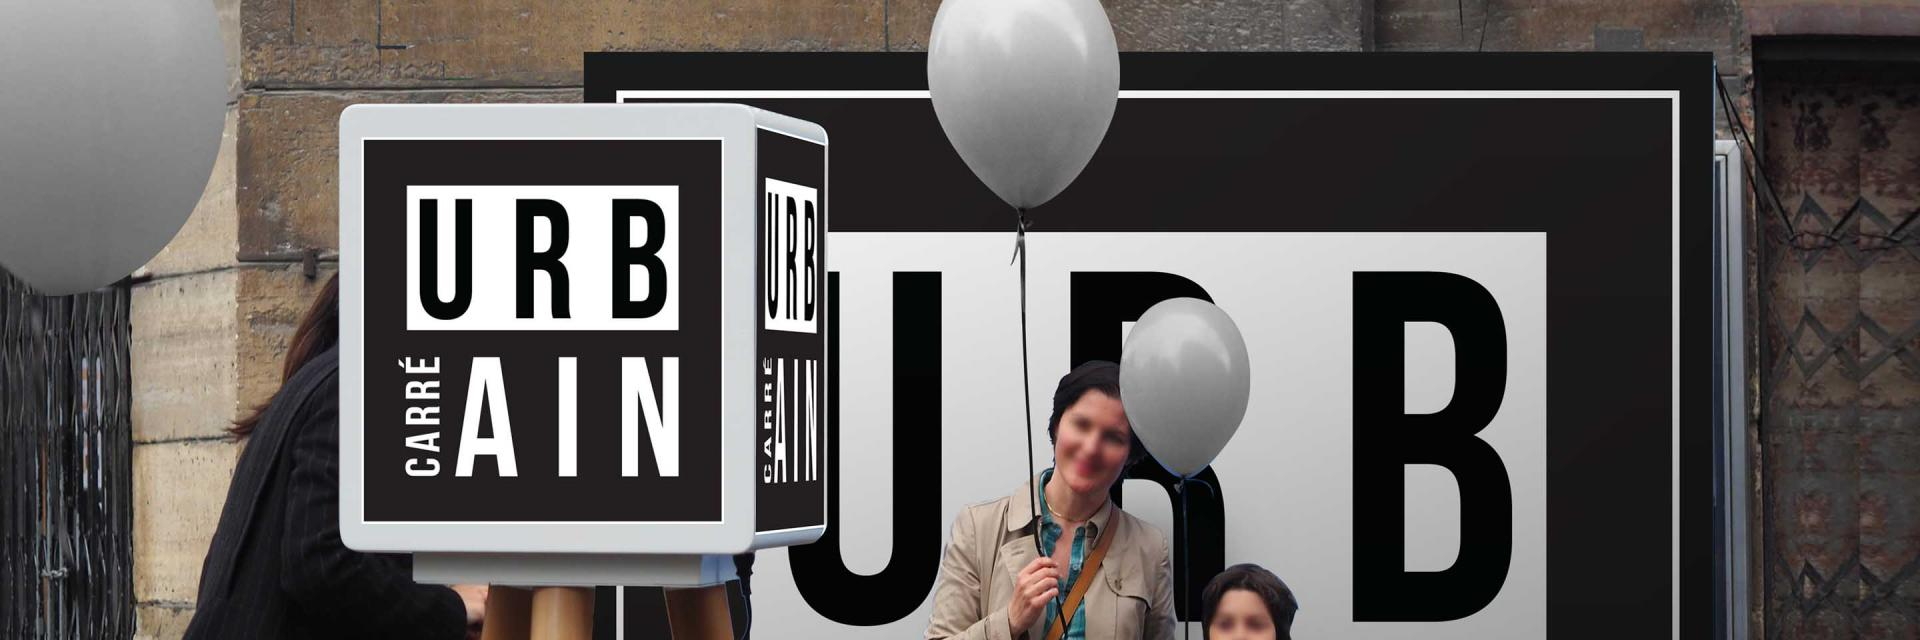 Street marketing photo booth